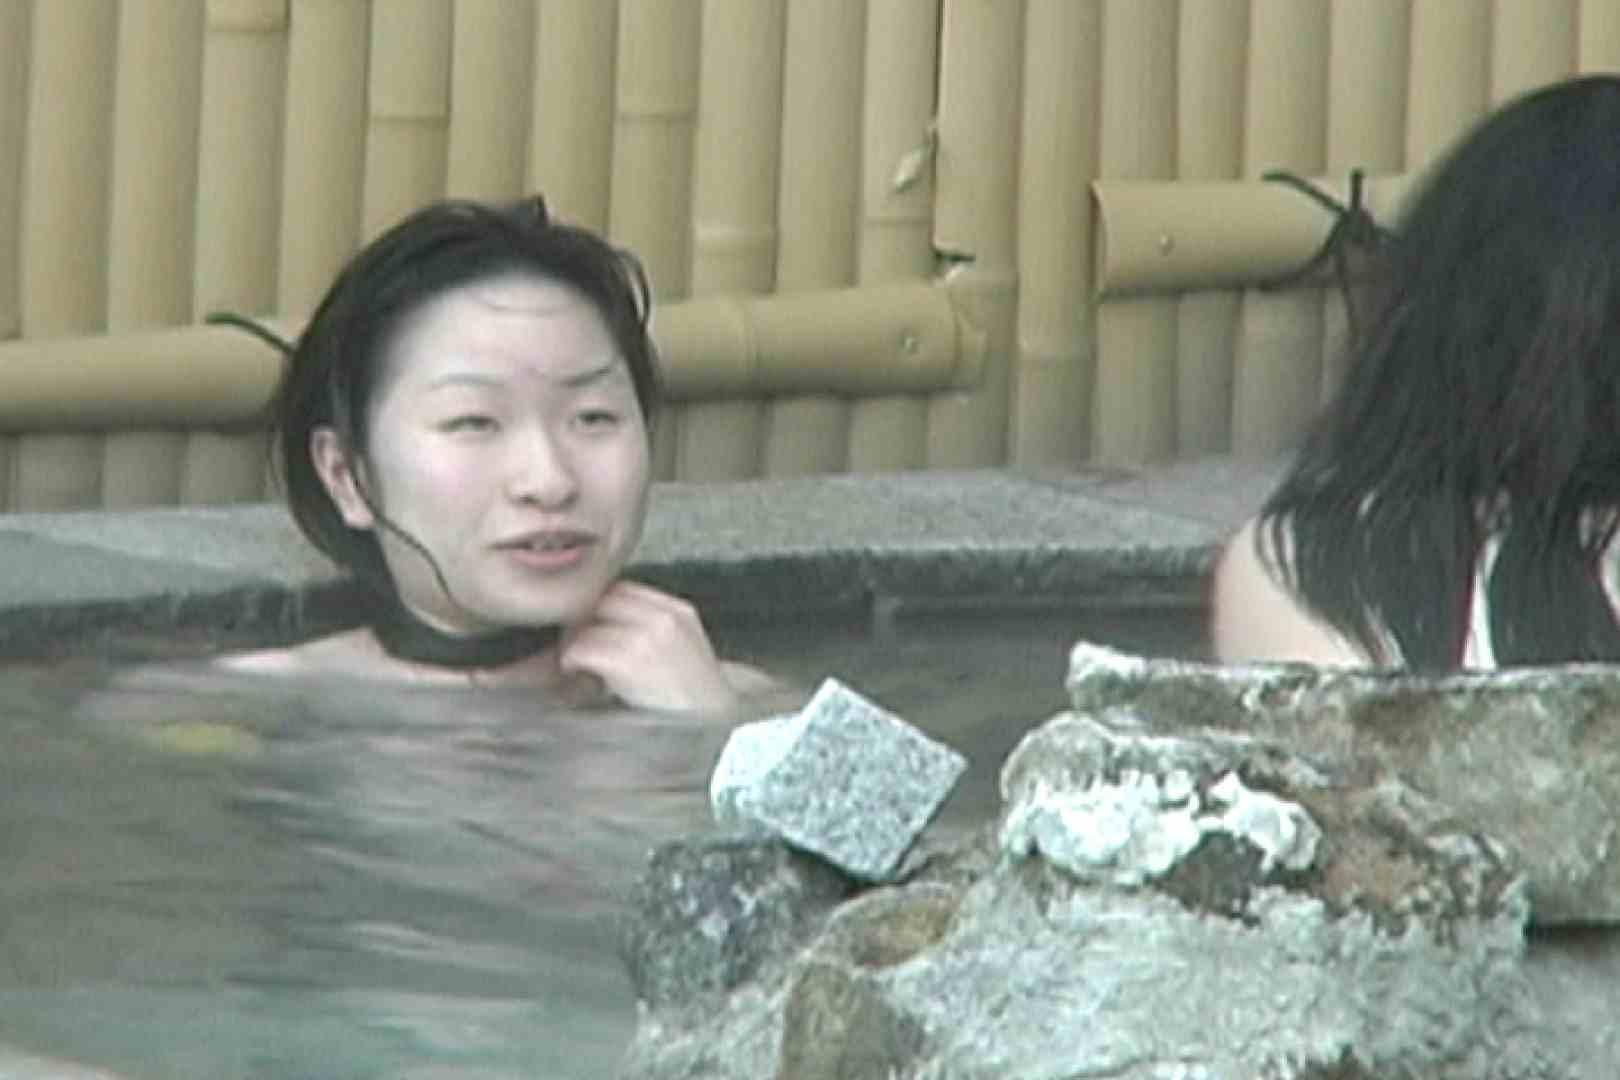 Aquaな露天風呂Vol.595 0 | 0  89連発 77